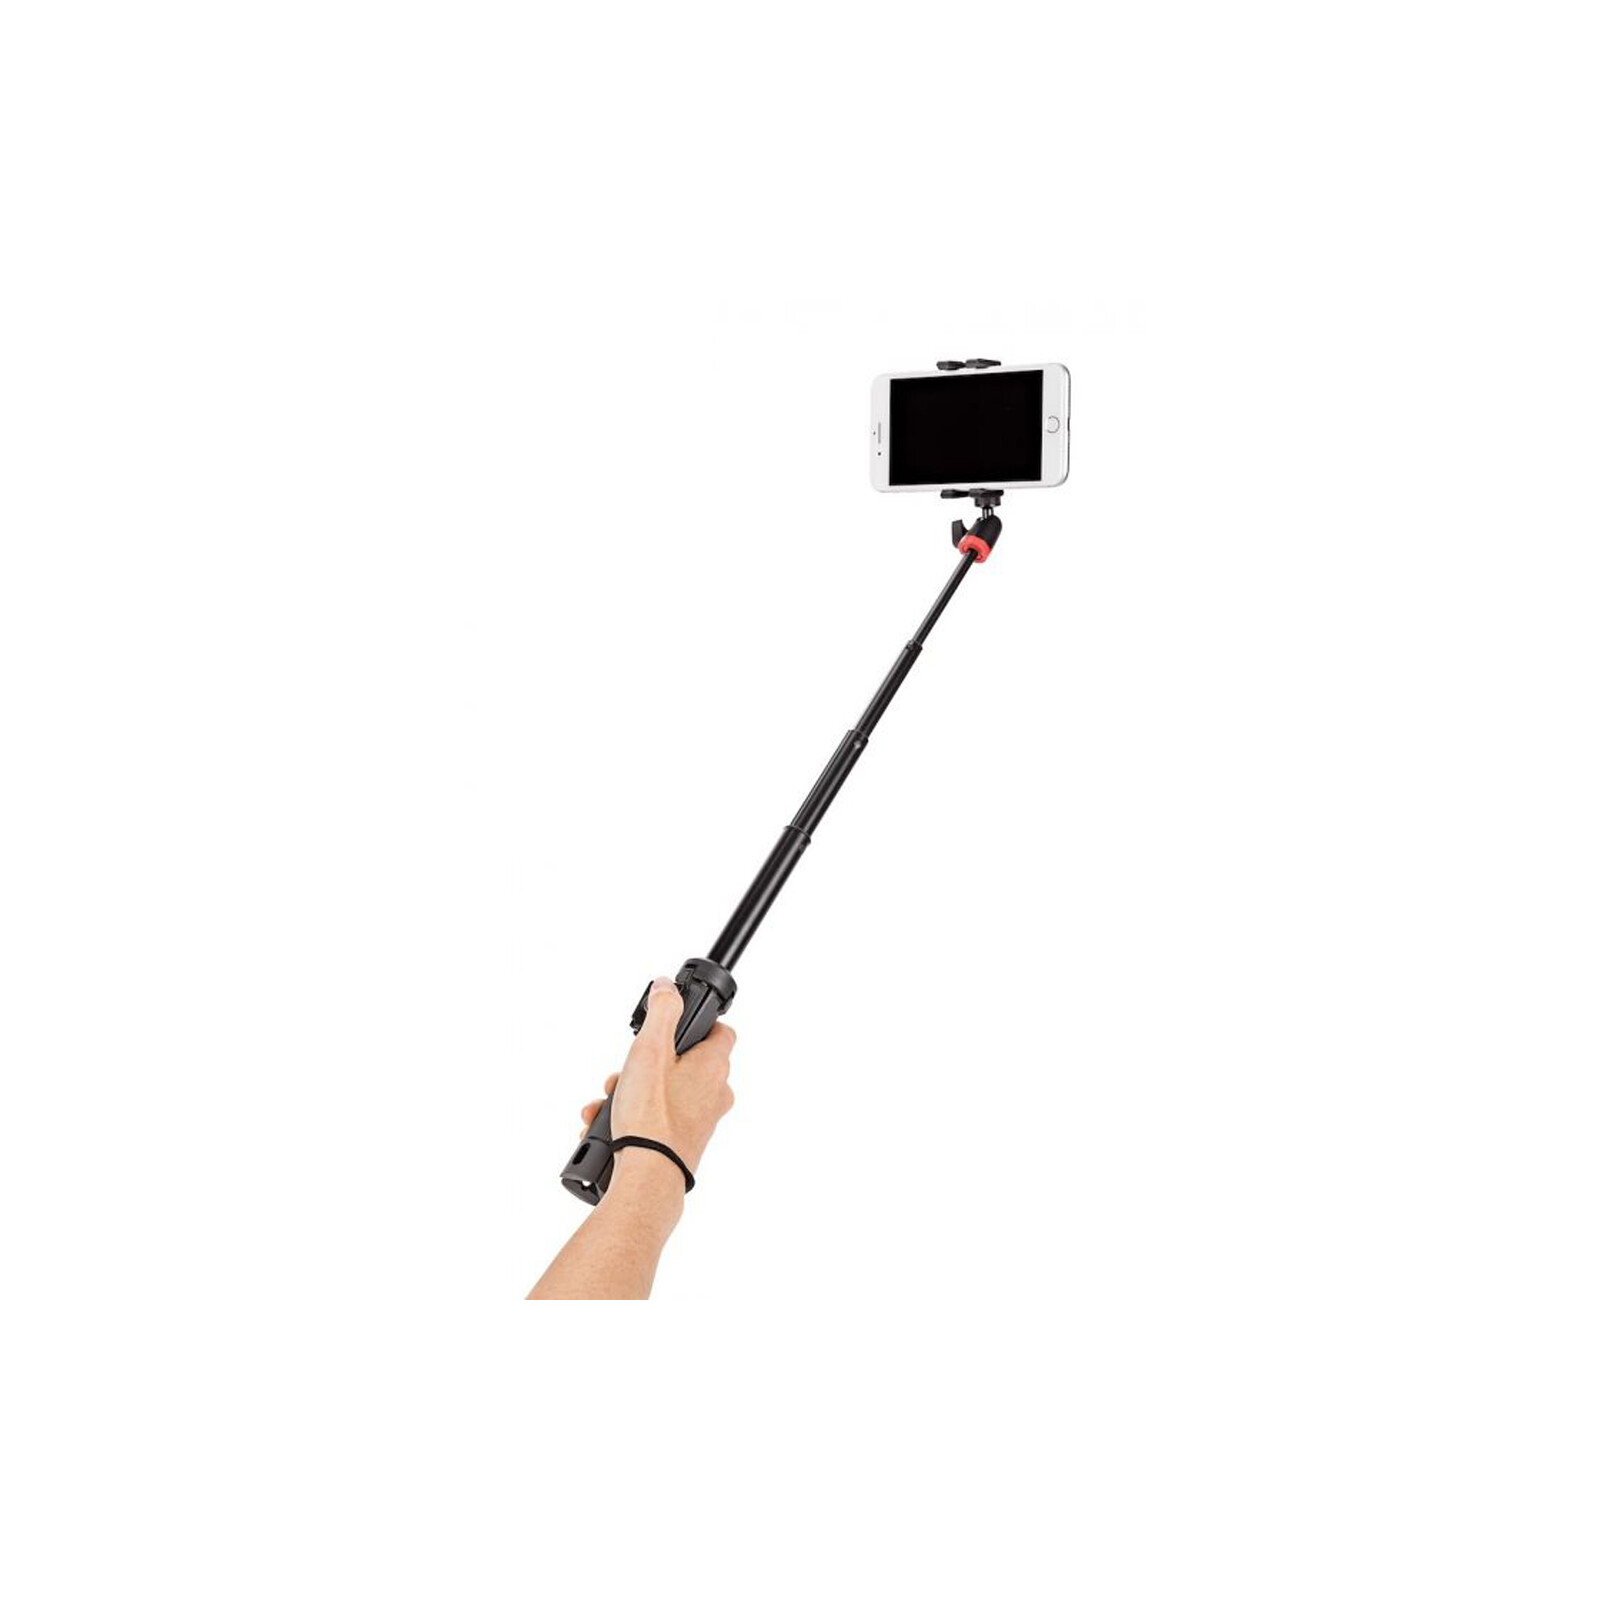 Joby TelePod Mobile Schwarz/Charcoal